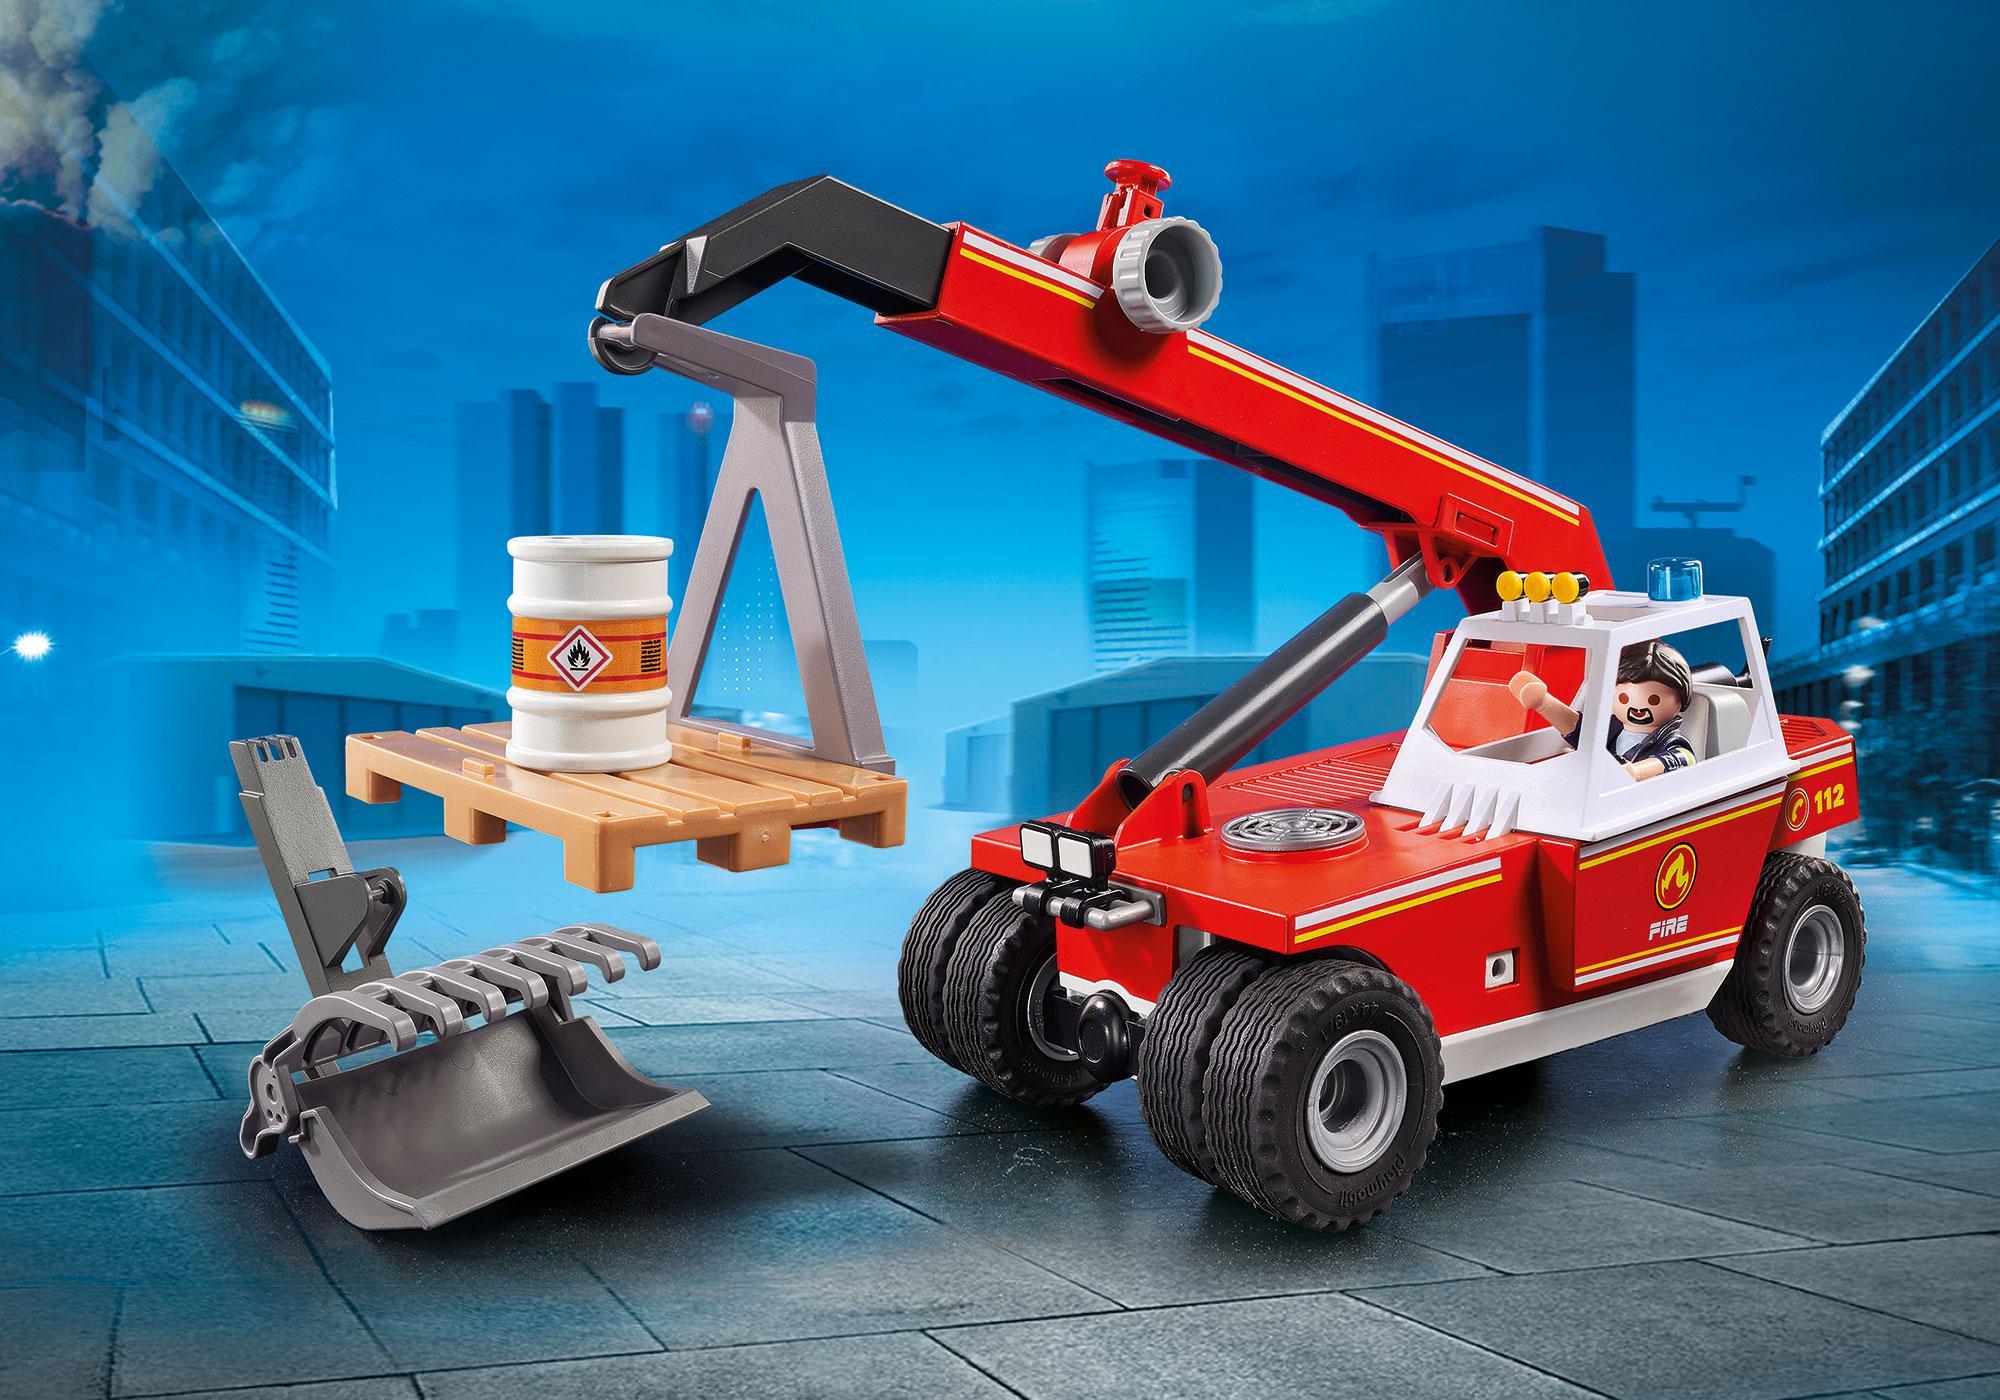 9465_product_detail/Γερανός Πυροσβεστικής